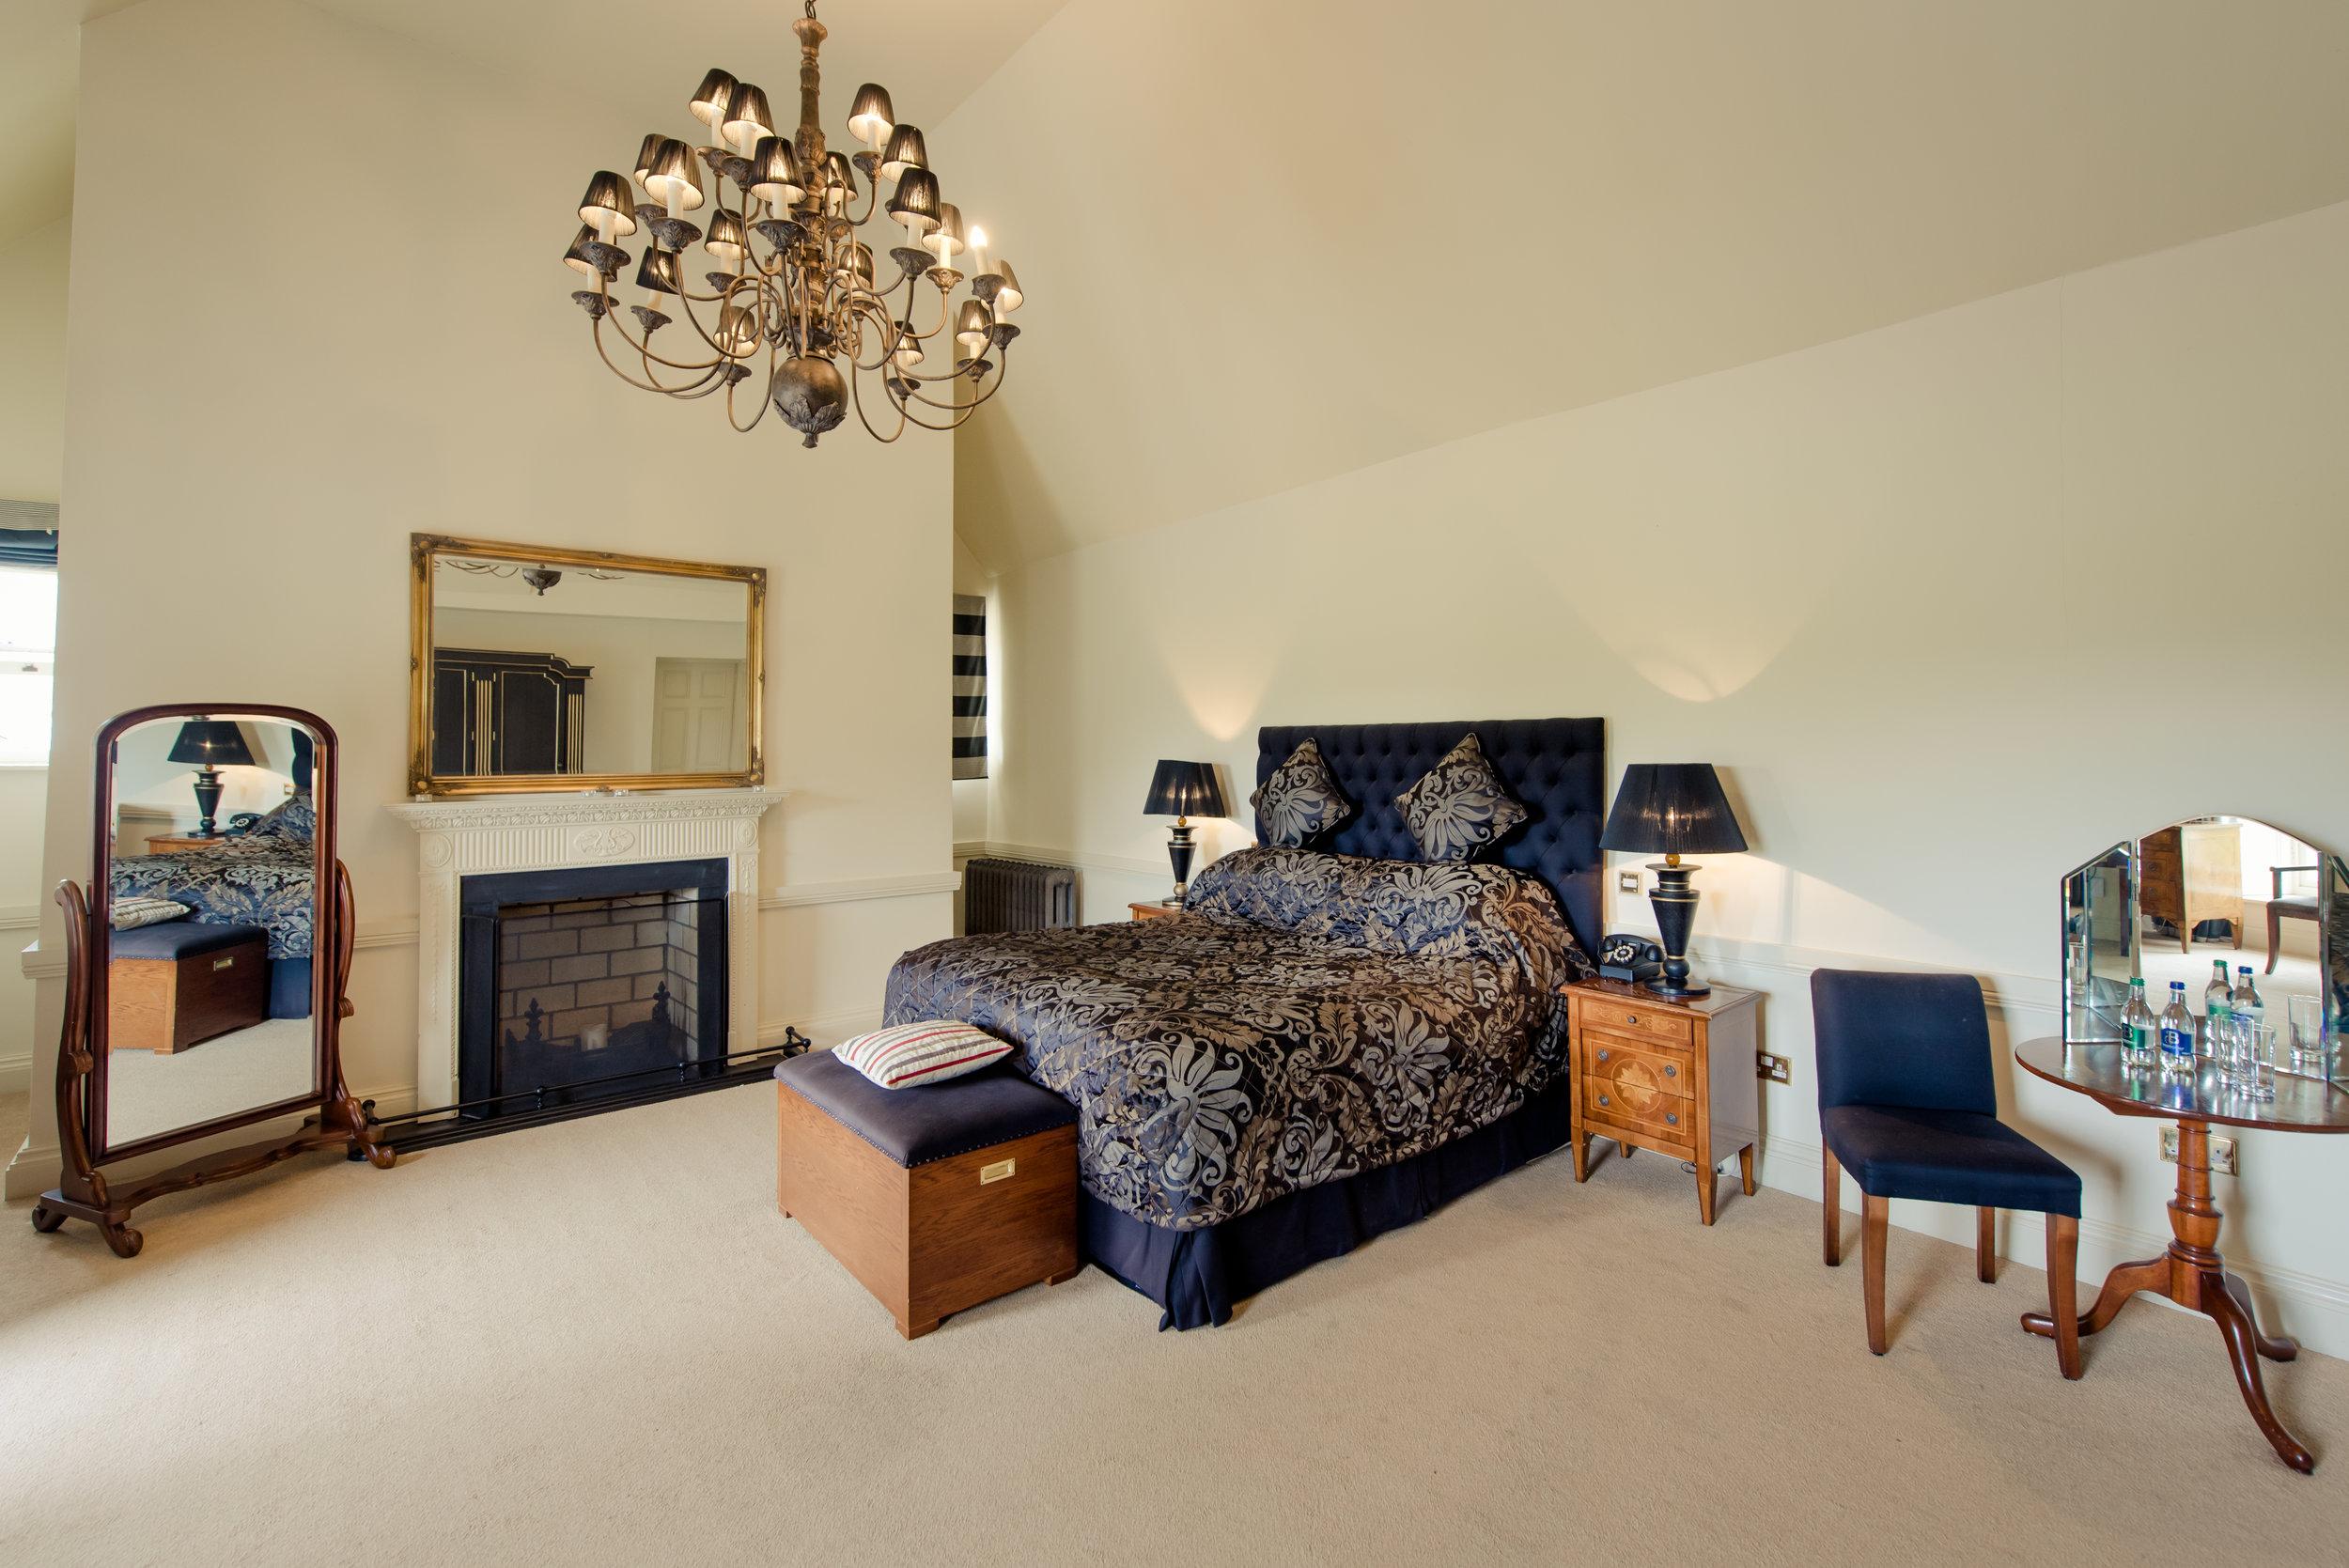 Tulfarris Hotel & Golf Resort Manor House luxurious bedroom with chandelier.jpg